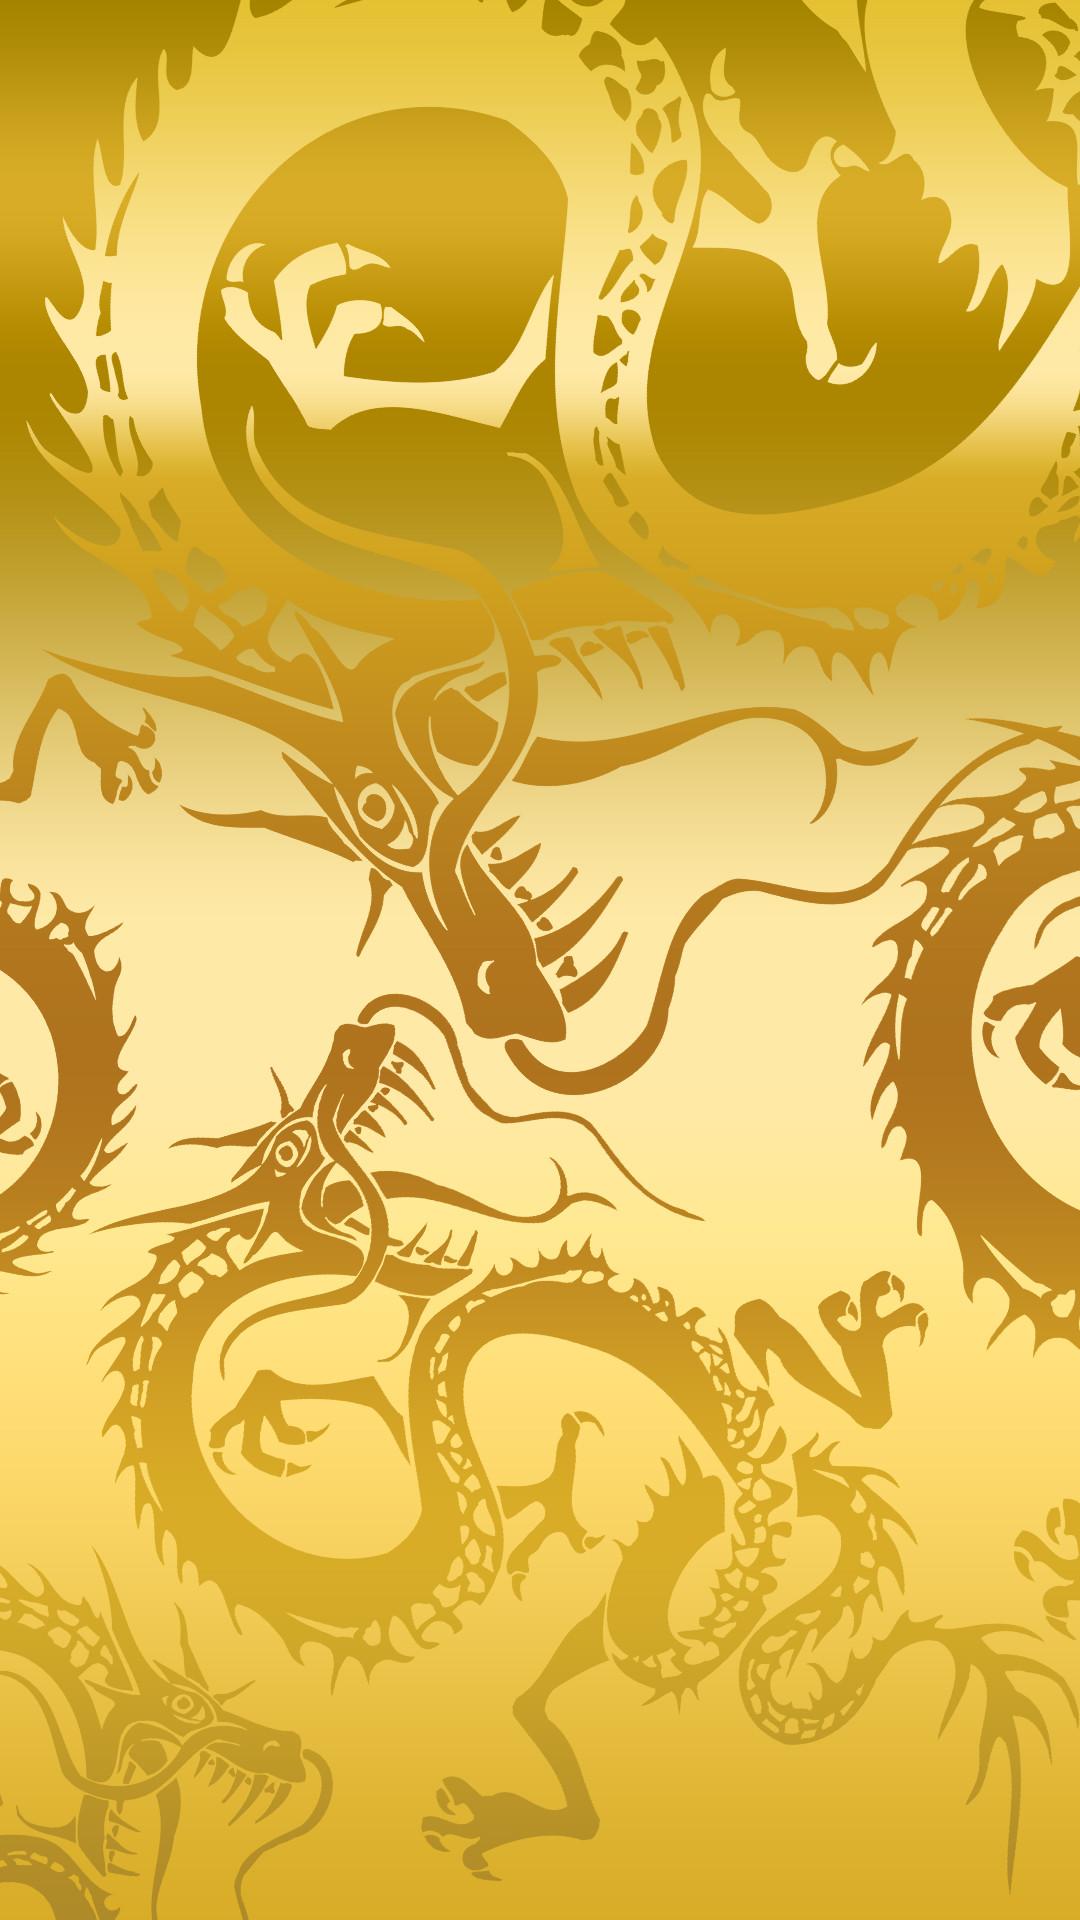 Phone Number For Golden Dragon